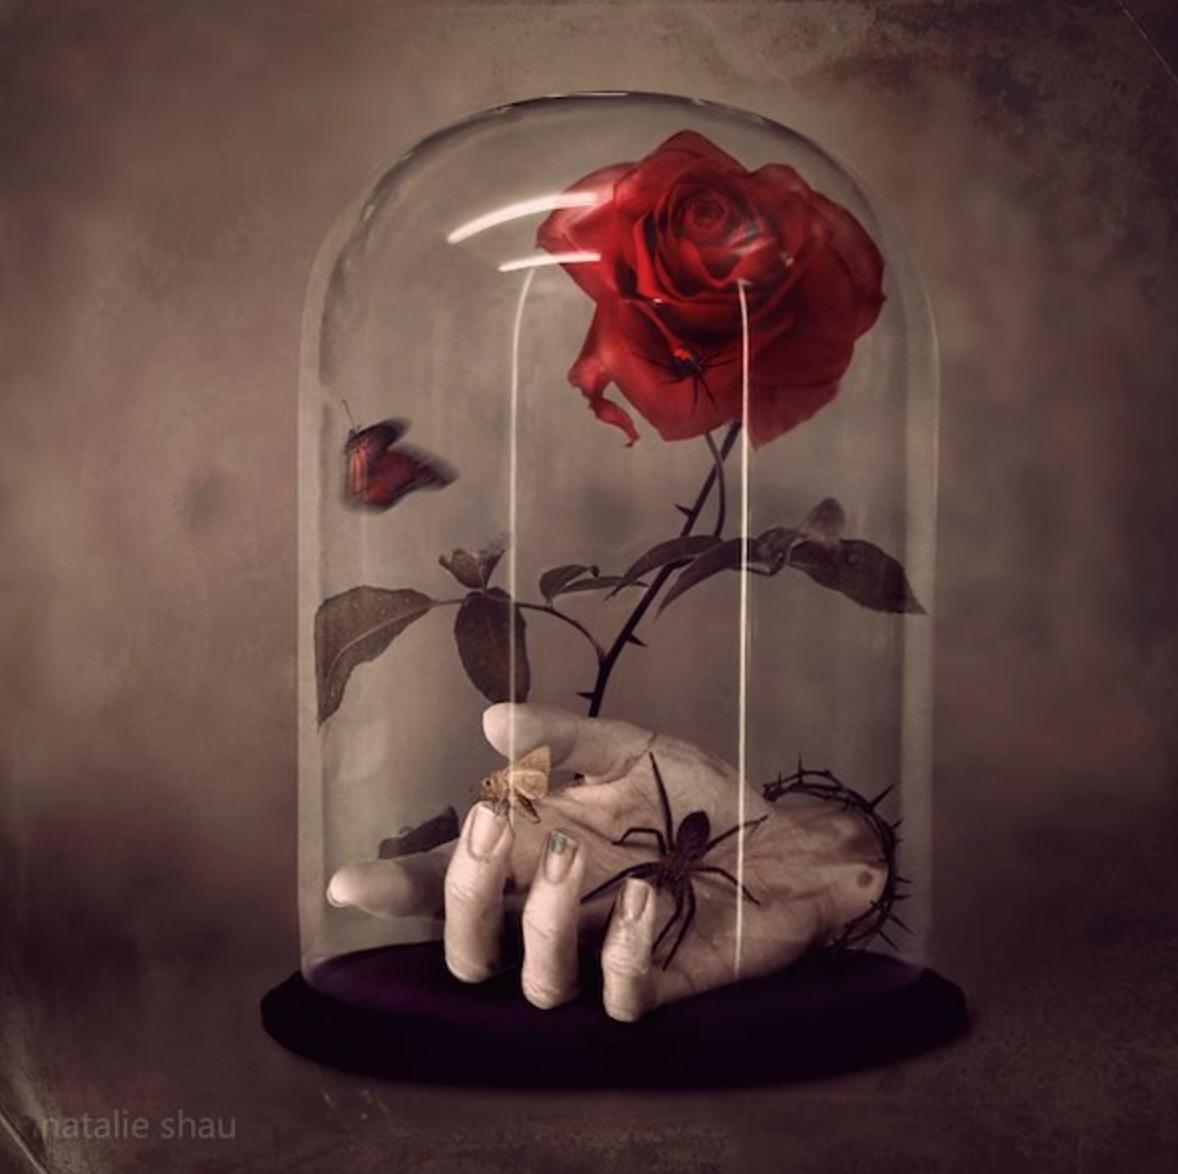 Cradle of Filth 1 - Music Art Works by Natalie Shau